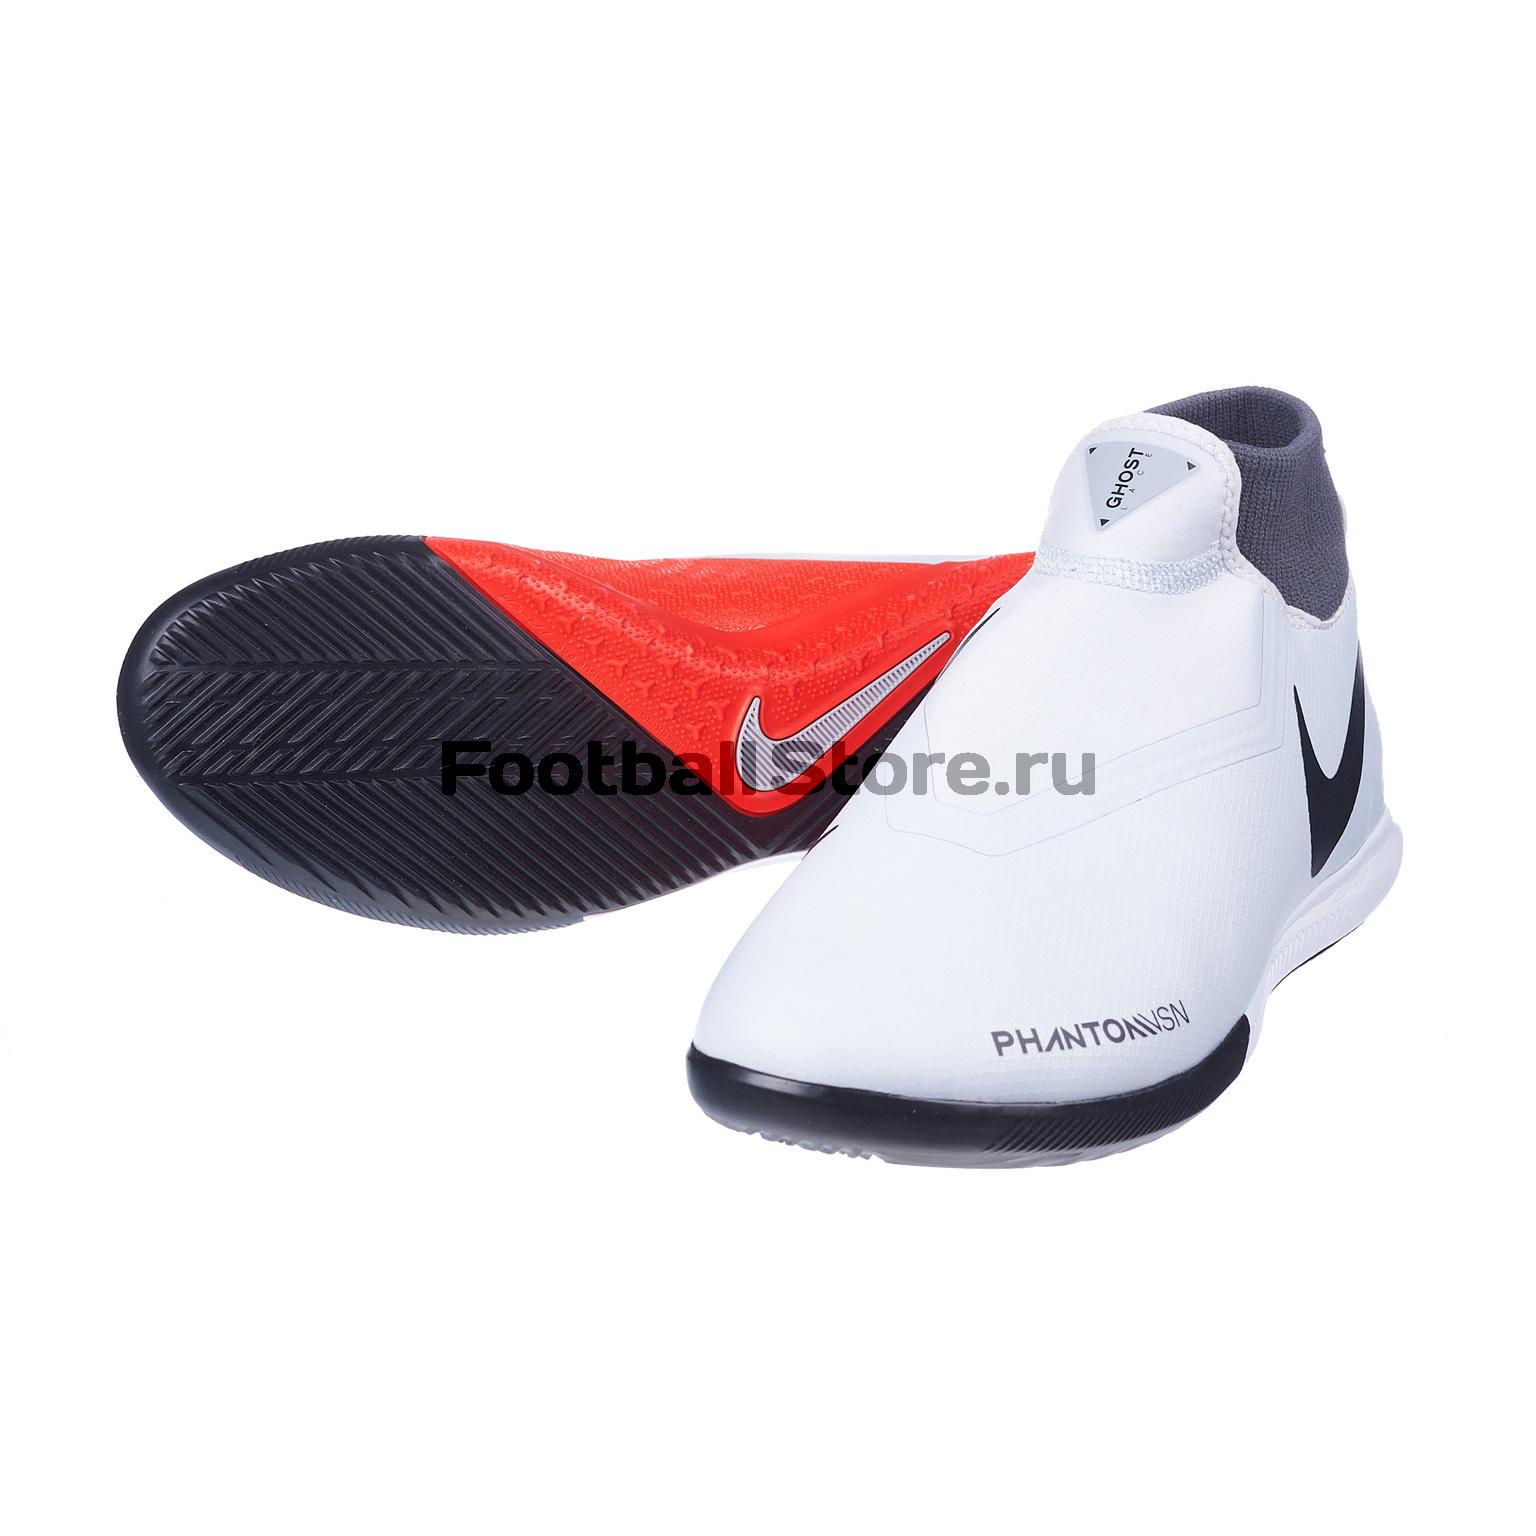 Обувь для зала Nike Phantom Vision Academy DF IC AO3267-060 шапки и кепки для туризма и кемпинга nike 666412 584169 410 010 688767 043 100 060